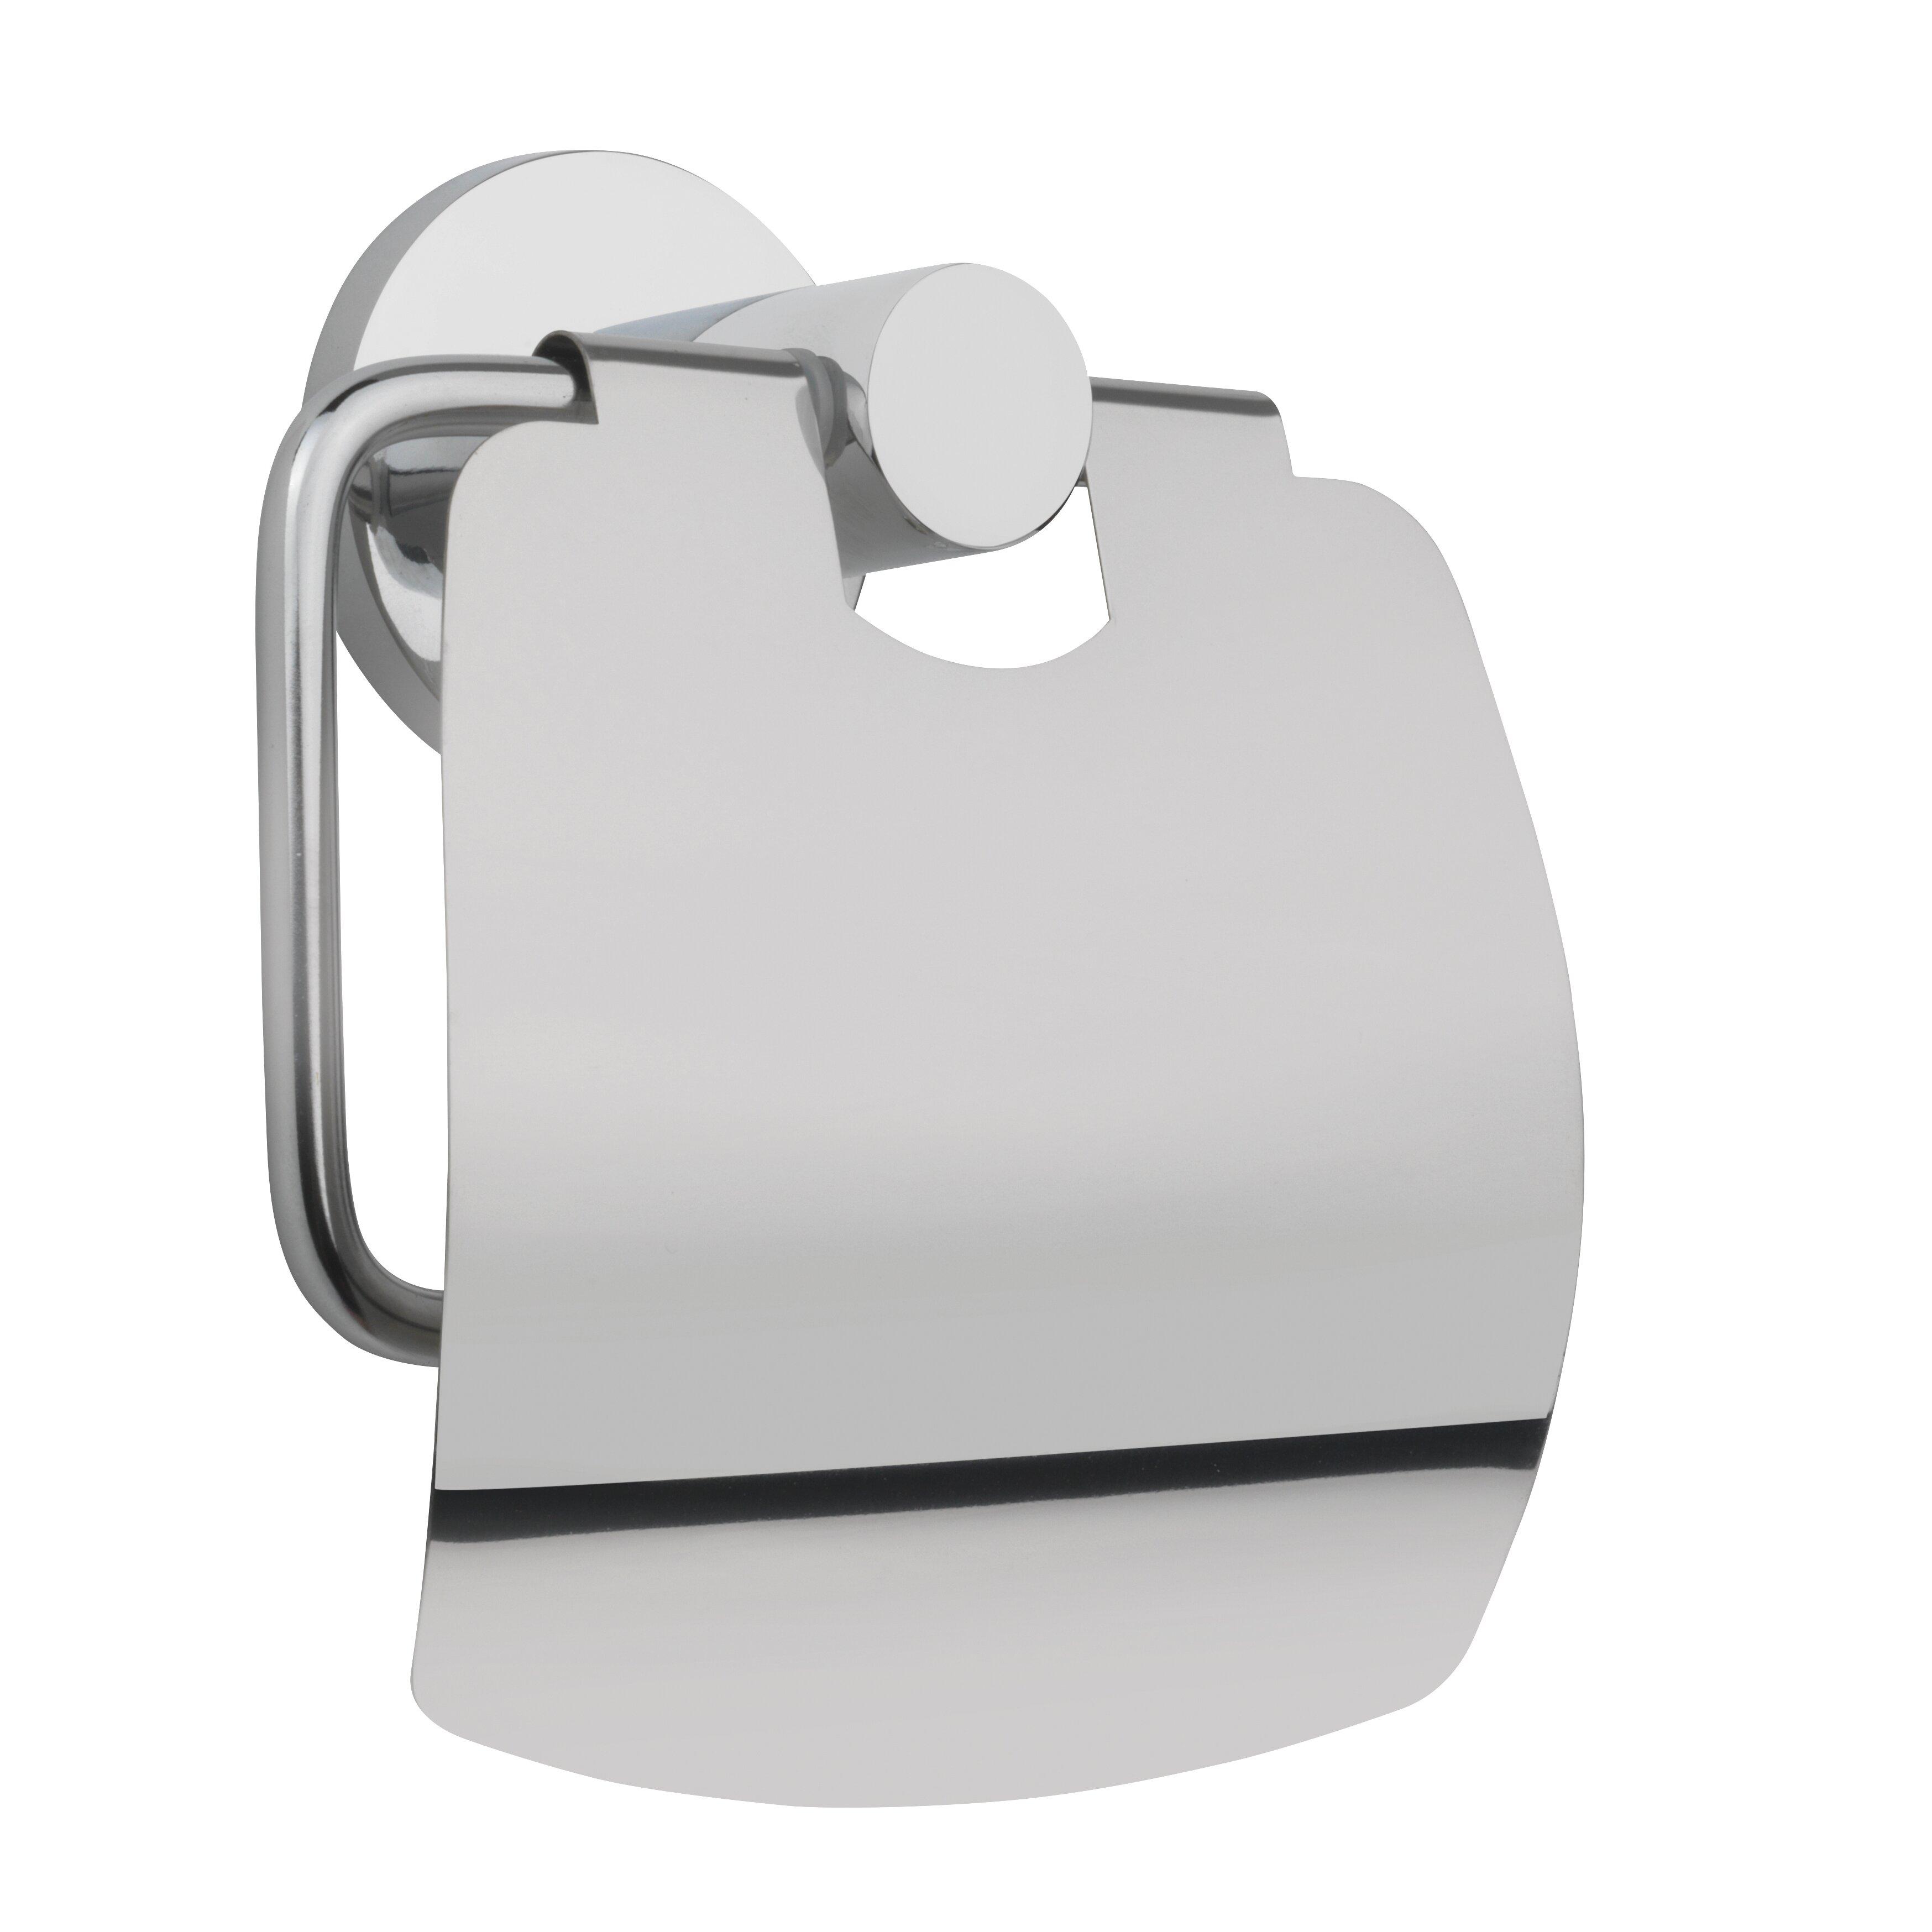 Belfry wall mounted toilet roll holder reviews wayfair uk Glass toilet roll holder